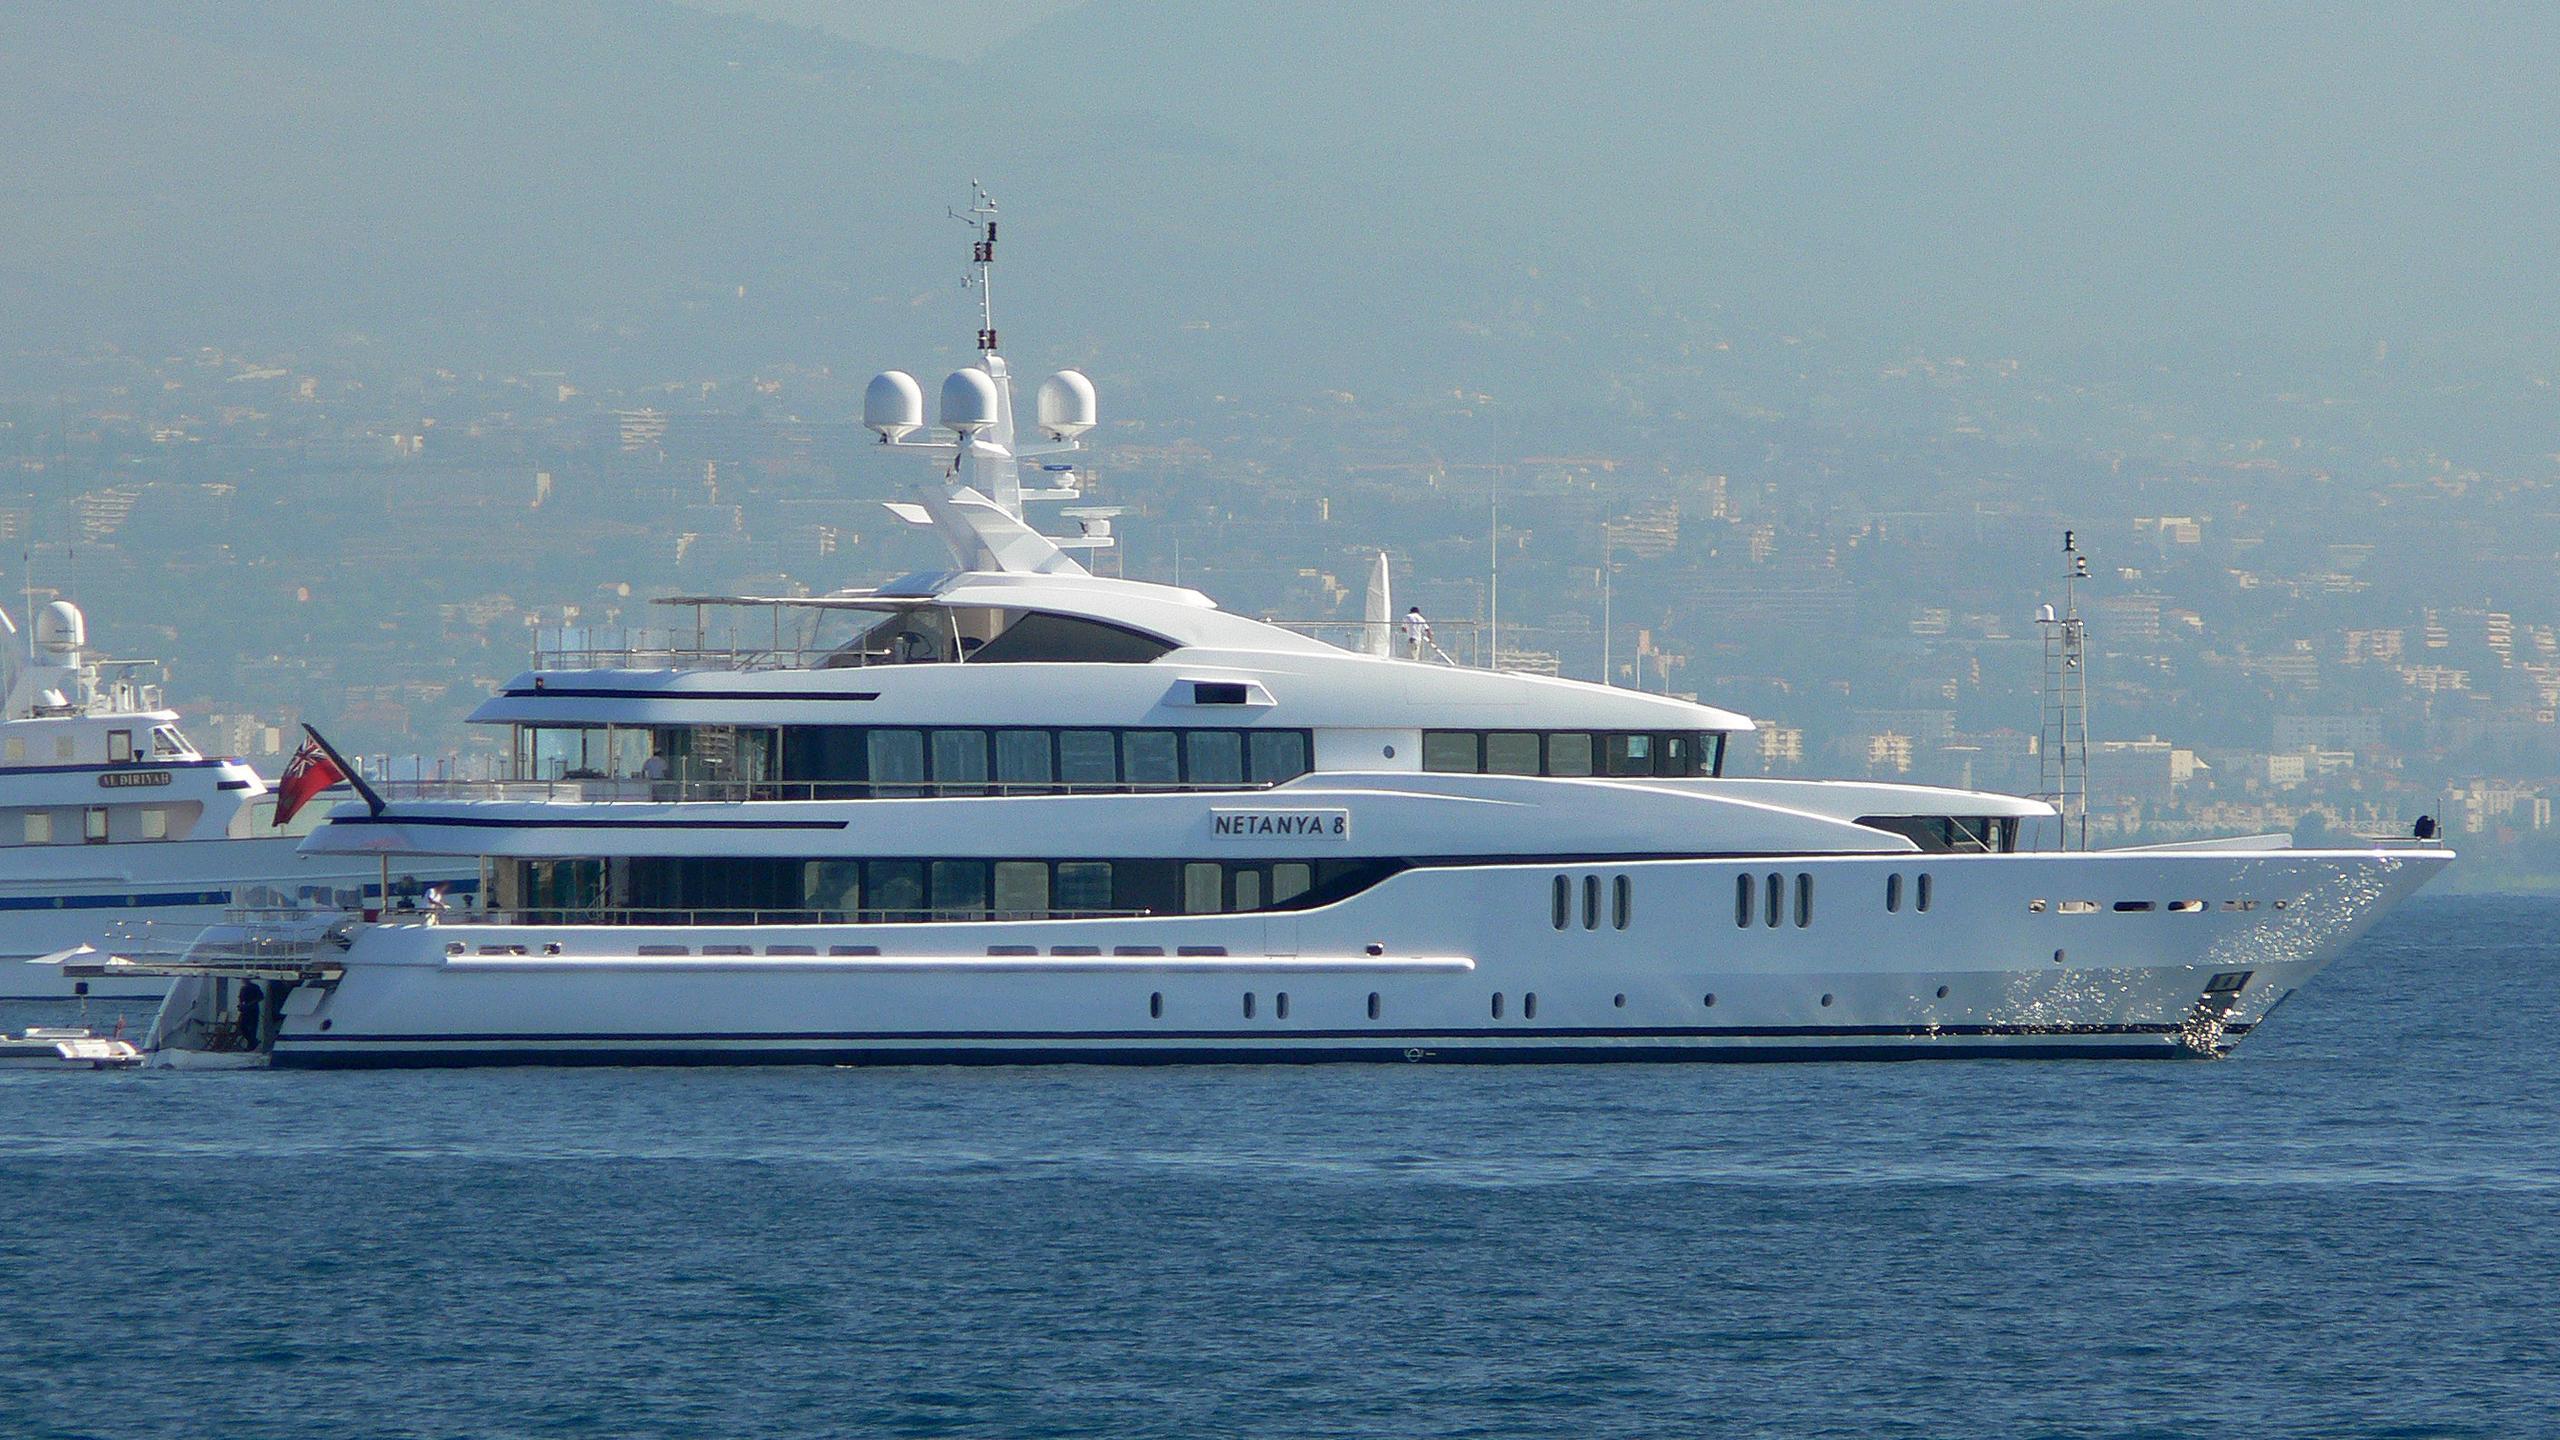 netanya-8-motor-yacht-cmn-2007-58m-profile